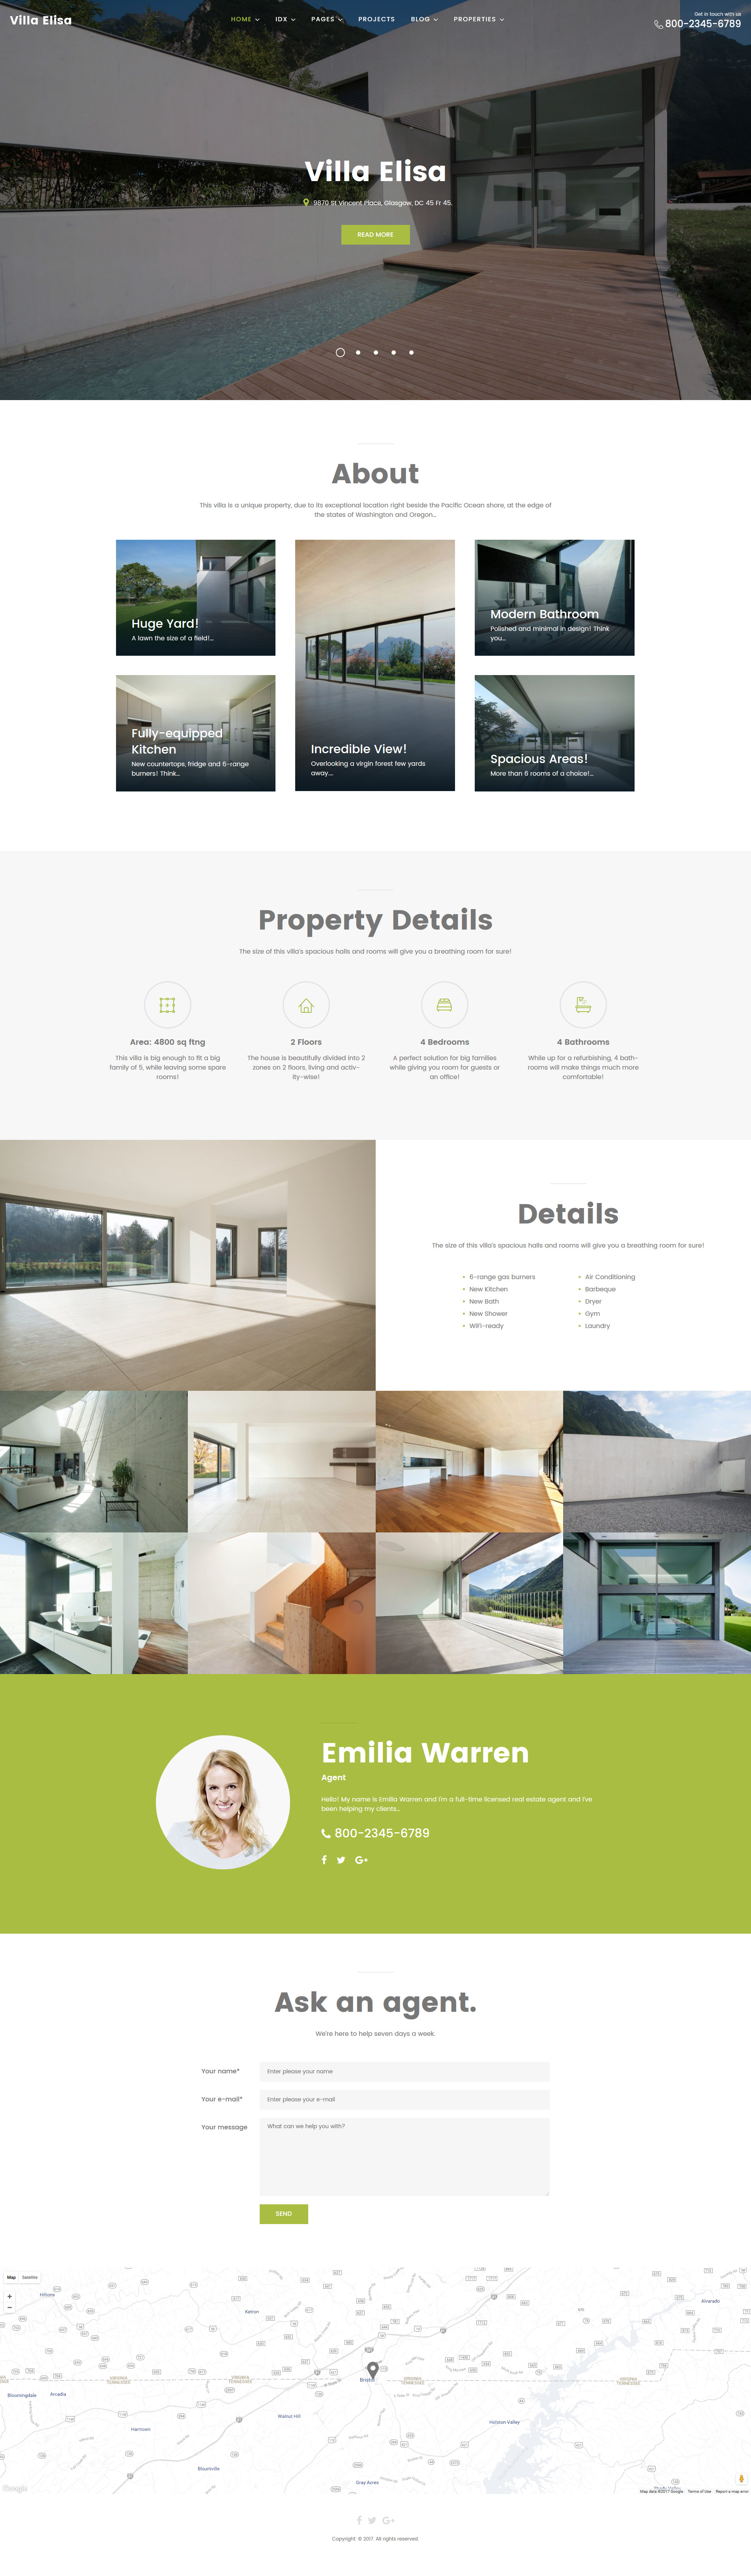 Адаптивный шаблон сайта на тему агентство недвижимости #63428